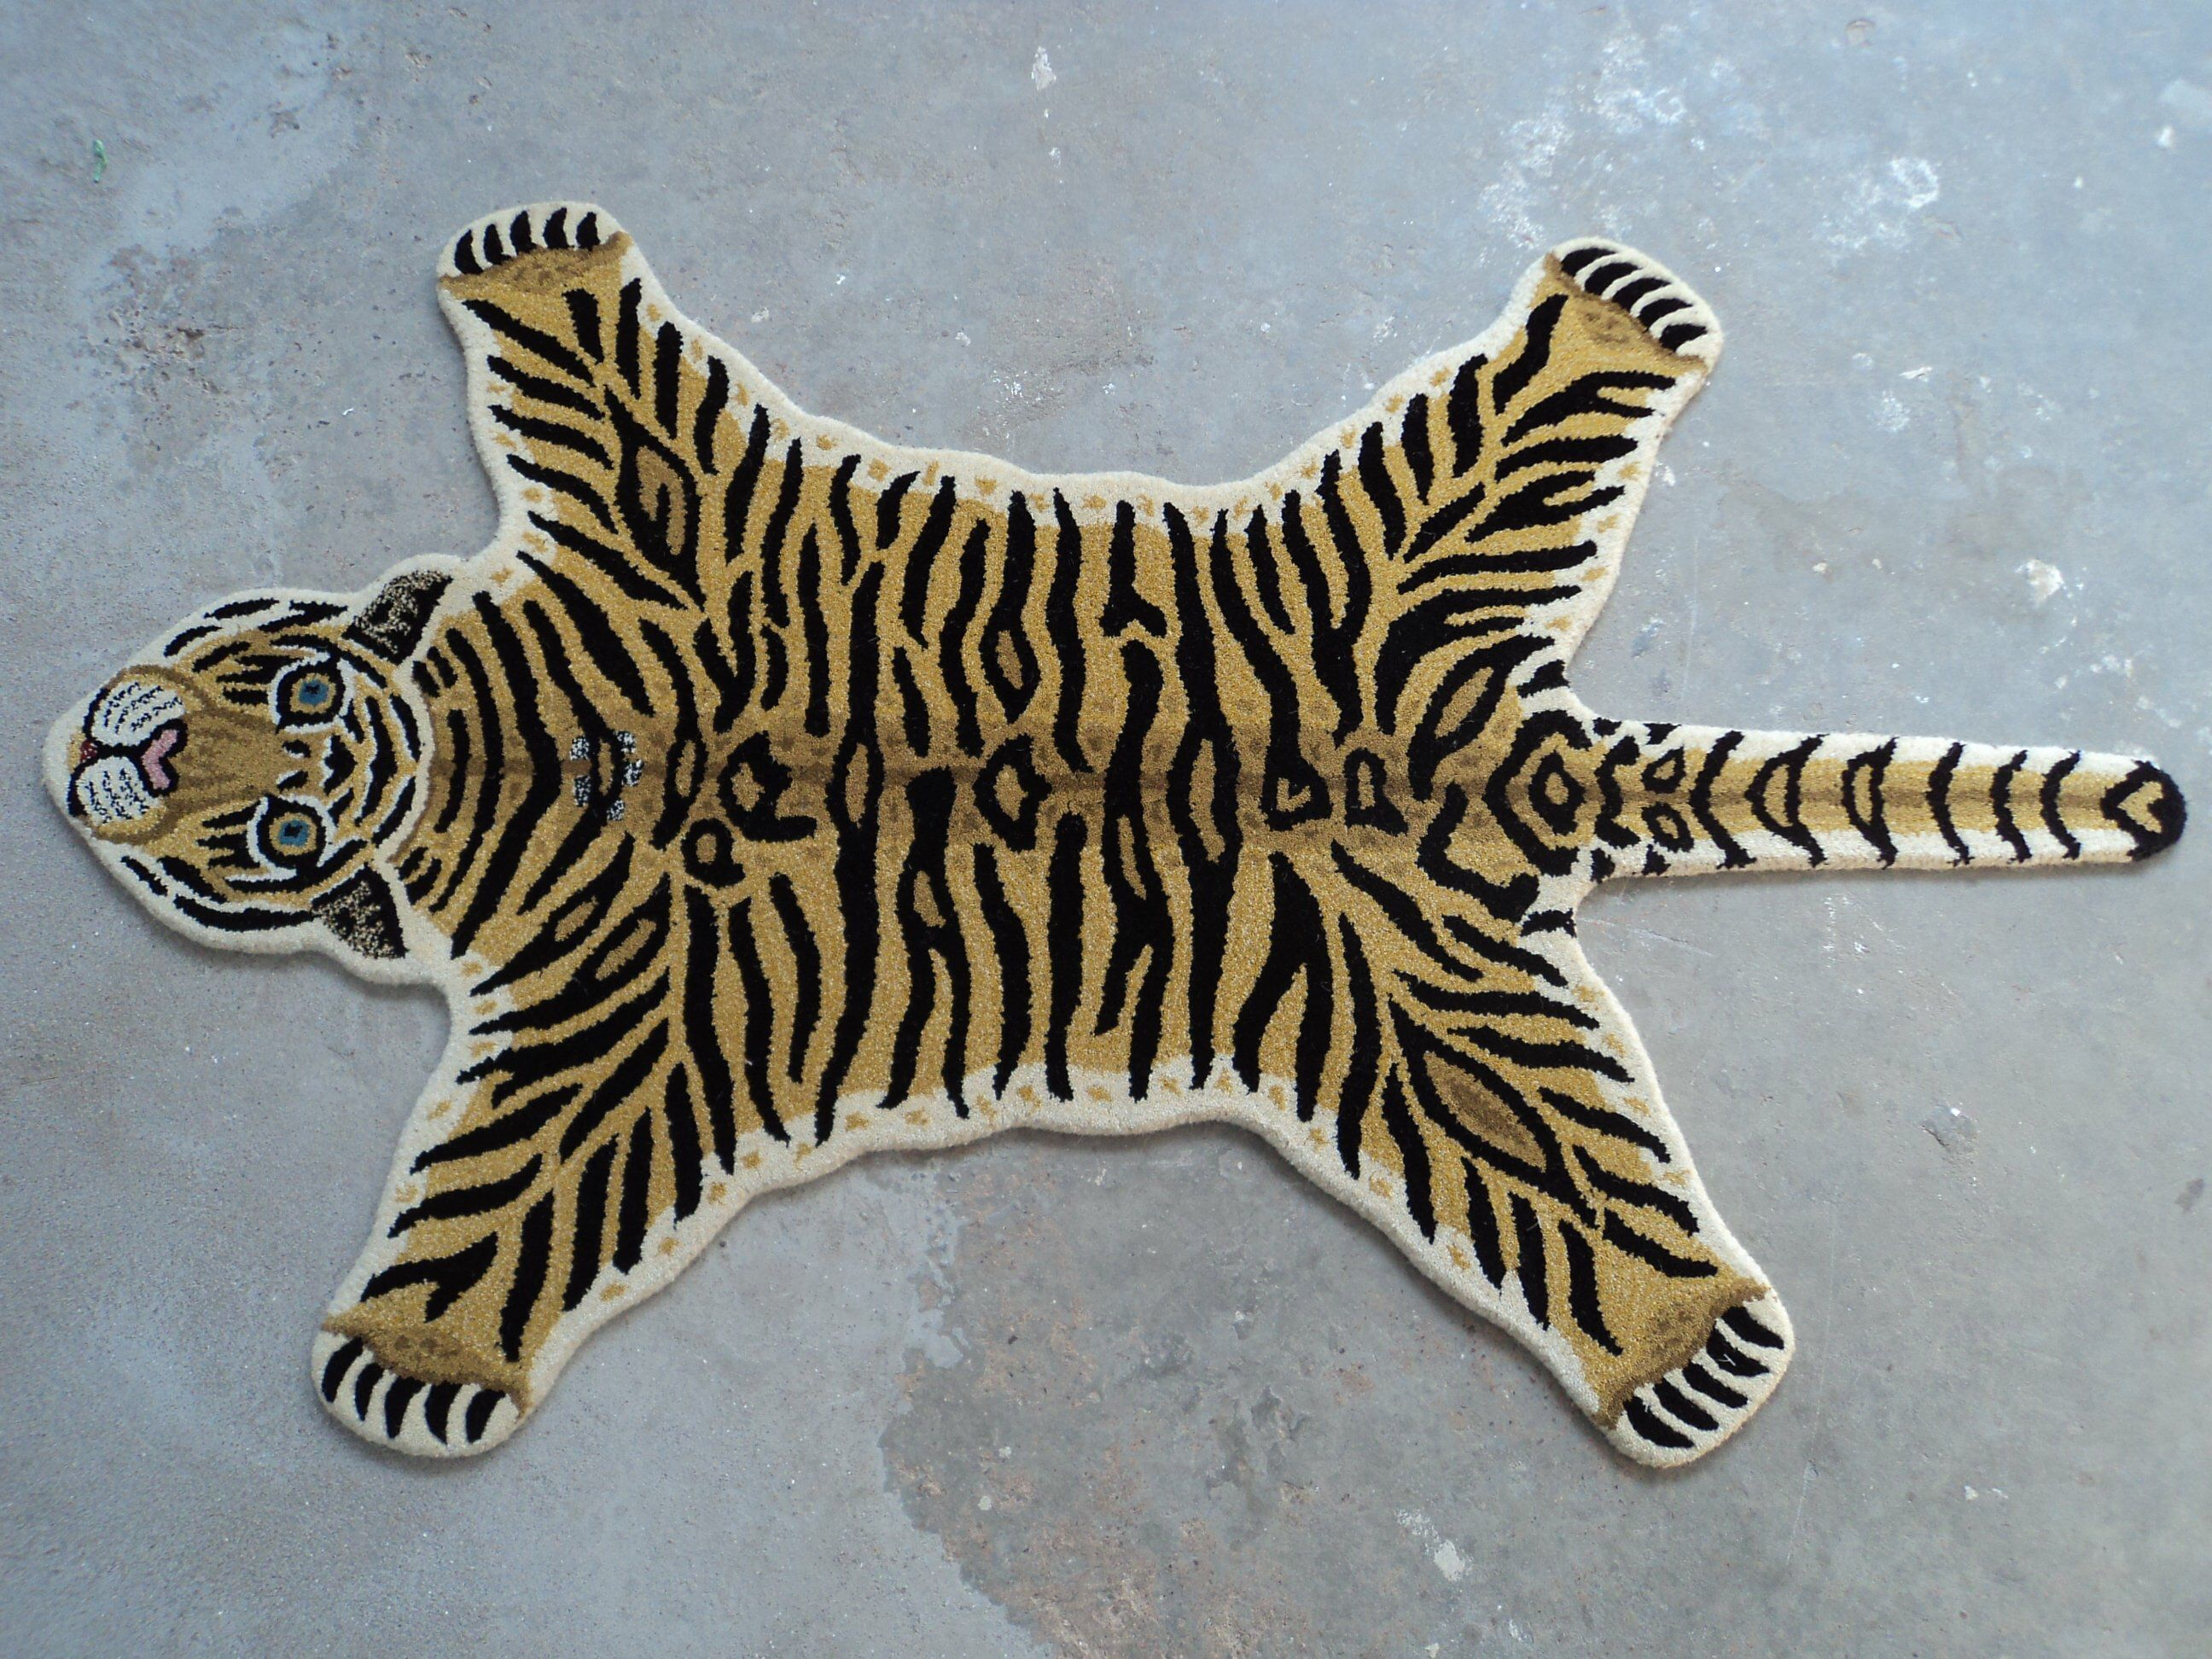 Tiger Mat Hand Tufted Tiger Skin Wool Carpet Home Decorative Etsy In 2020 Wool Carpet Animal Rug Tiger Rug